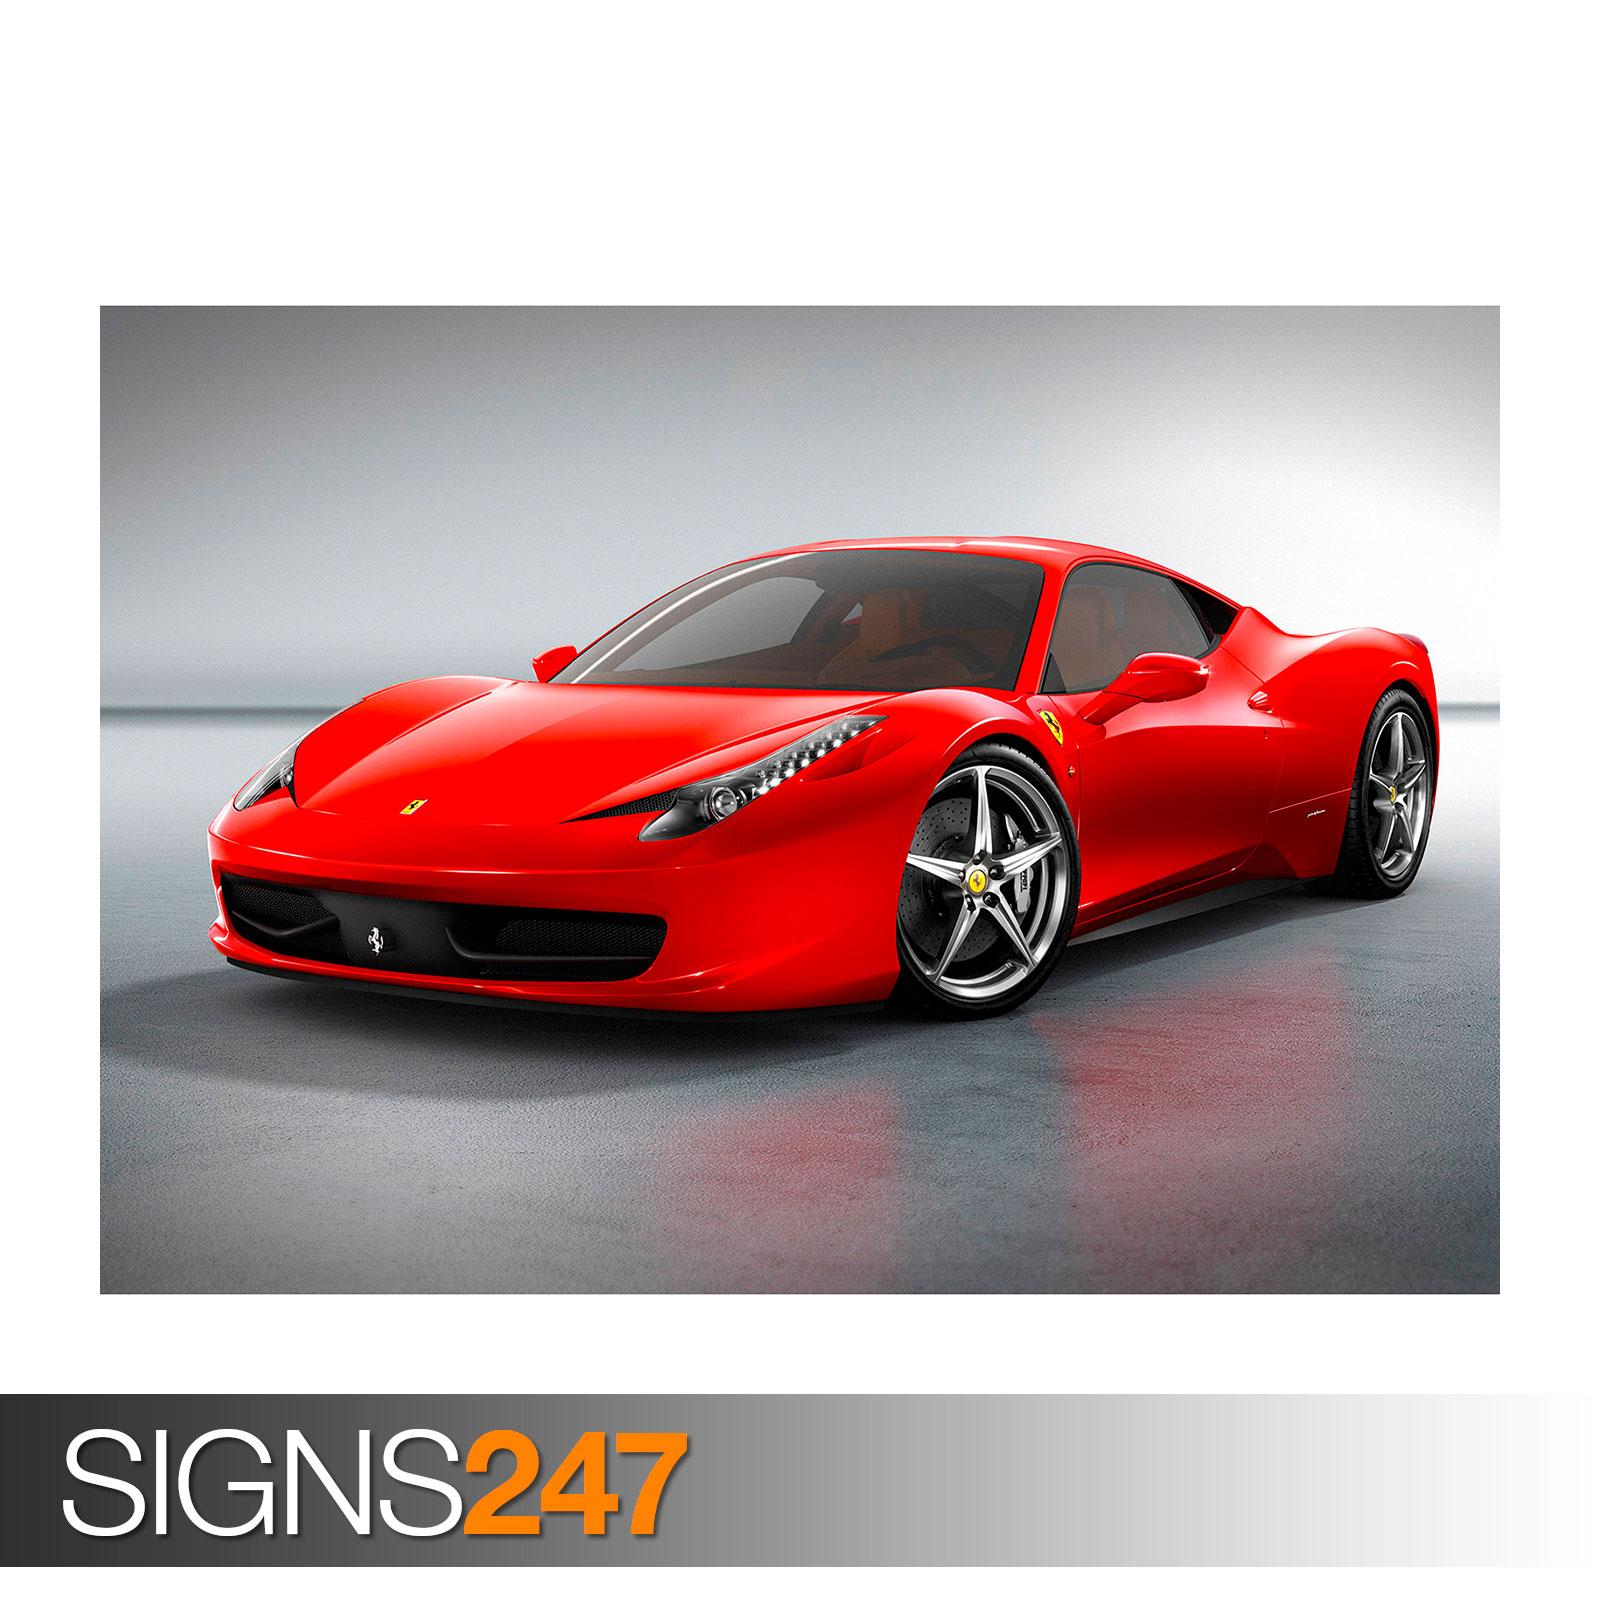 Car Poster Picture Poster Print Art A0 A1 A2 A3 A4 0816 FERRARI 458 ITALIA